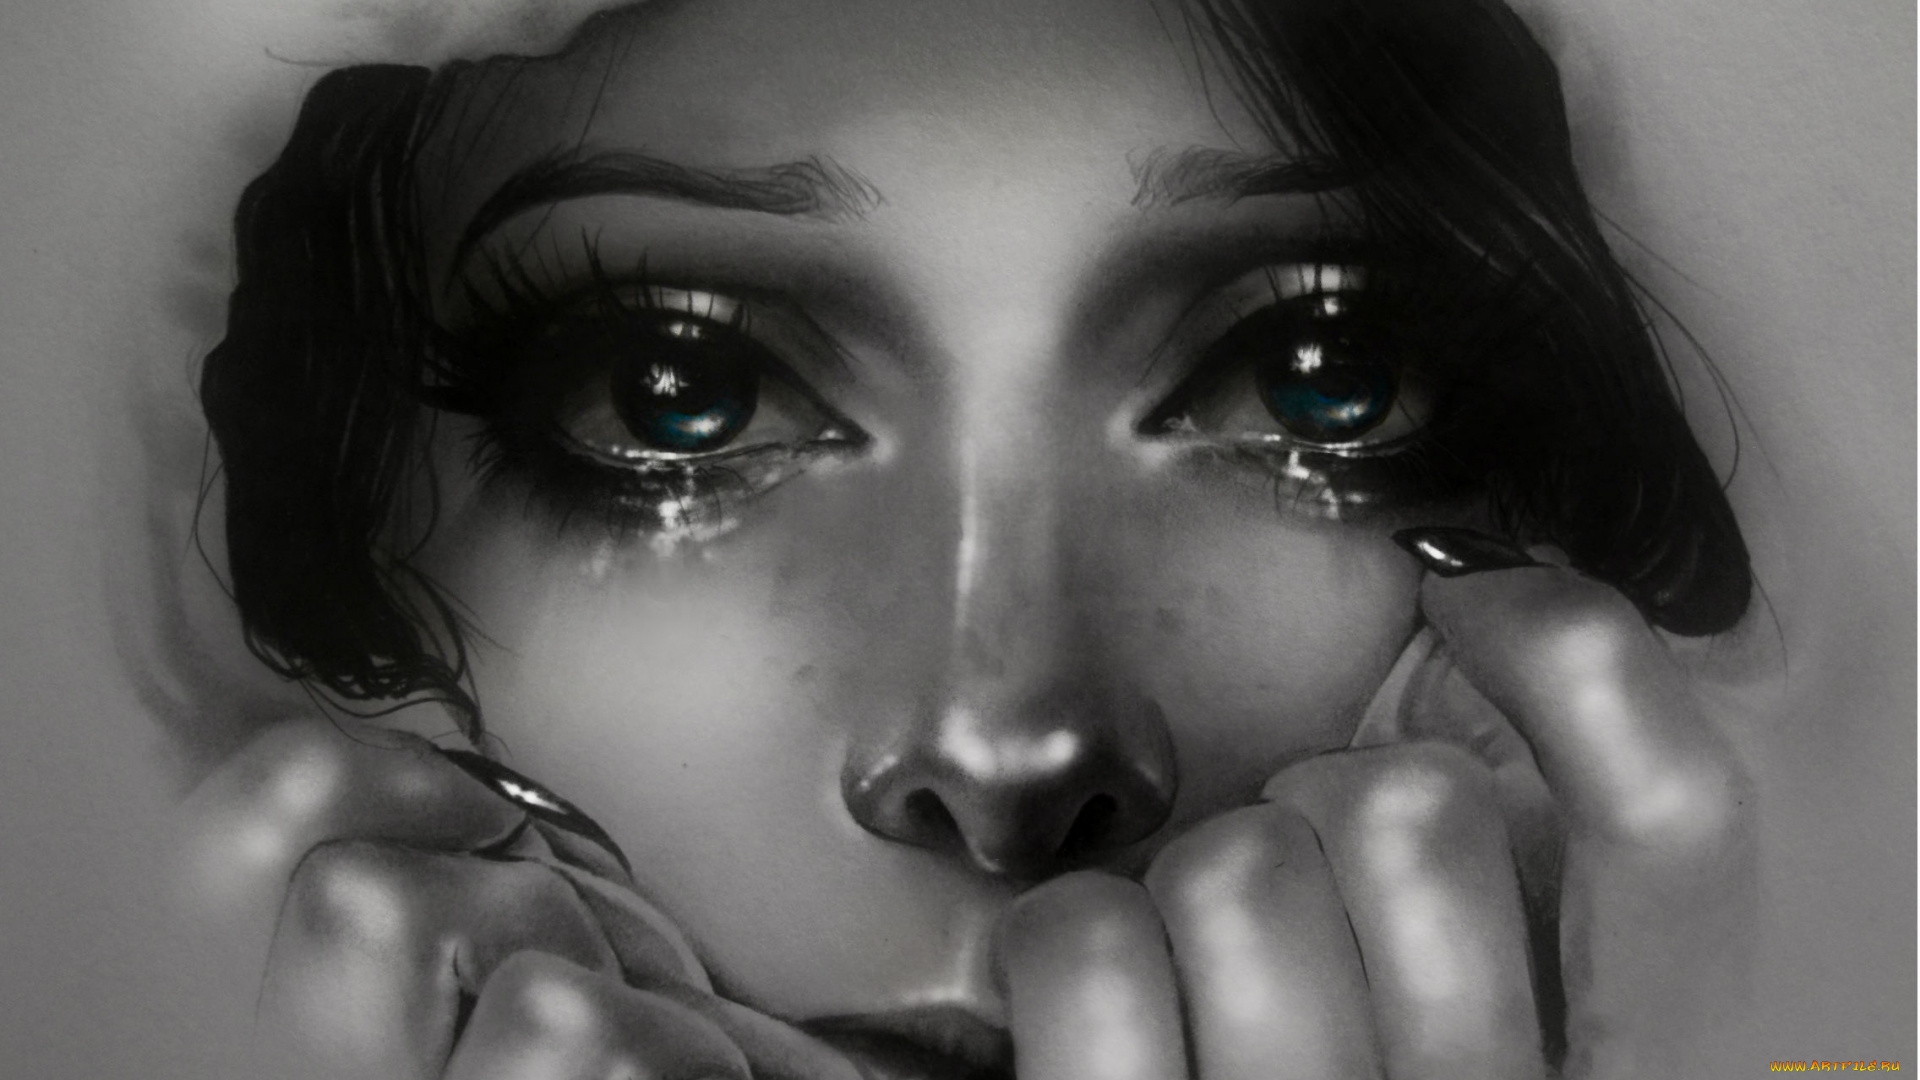 Супер картинки с плачущими